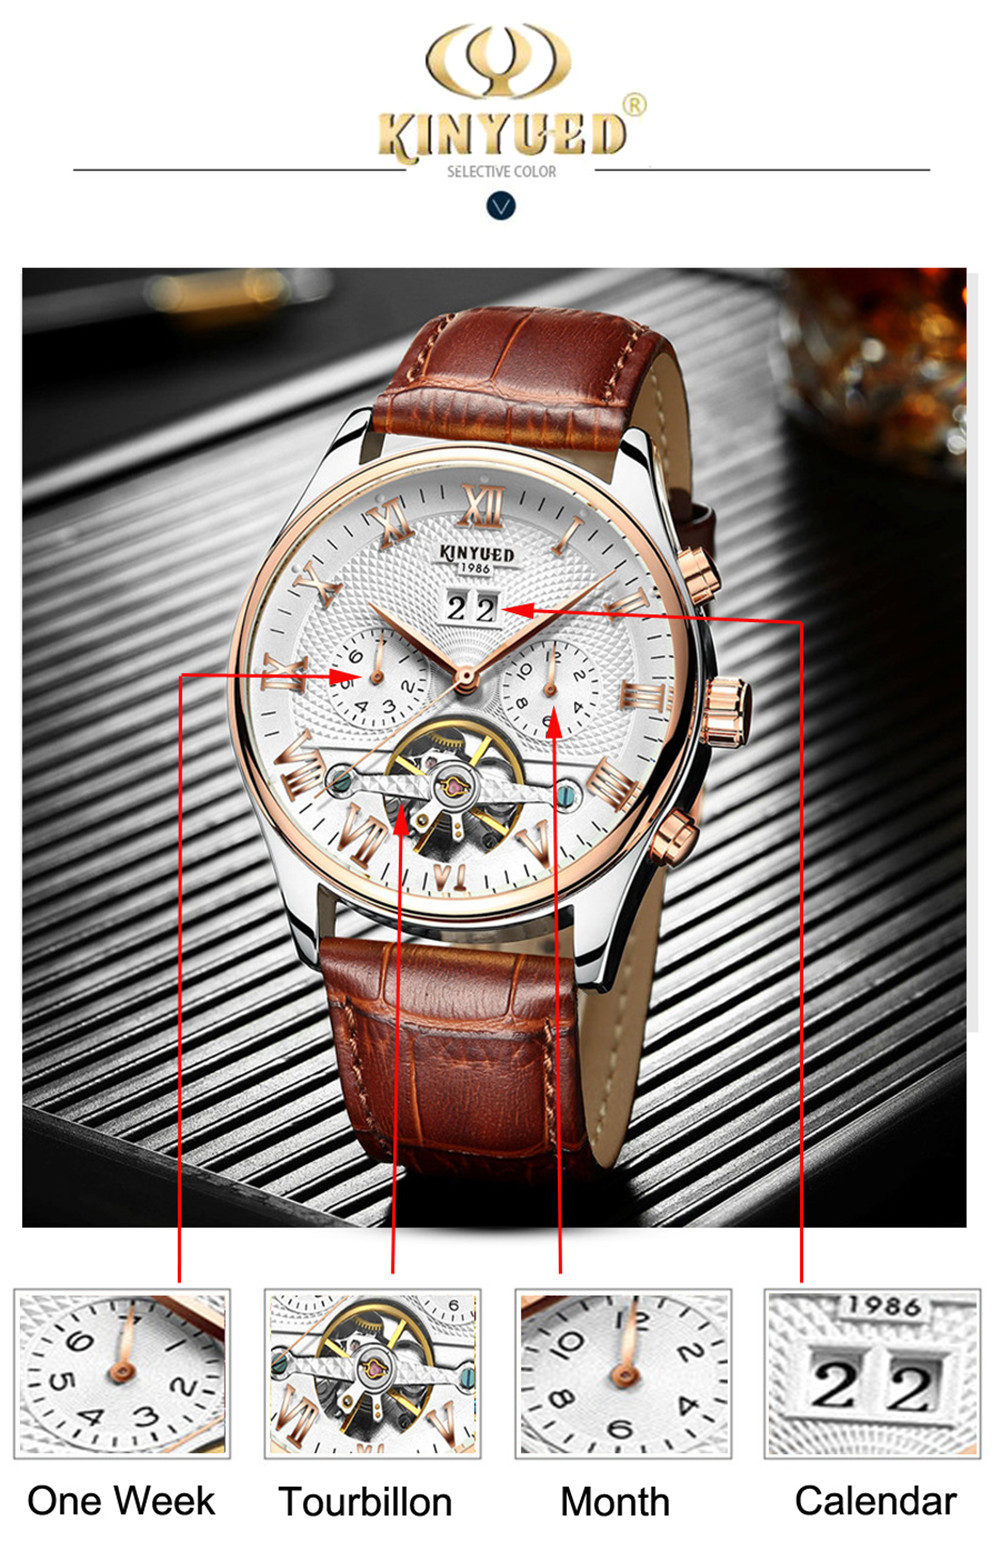 HTB1vTX6dBKw3KVjSZFOq6yrDVXa0 KINYUED 2019 Skeleton Tourbillon Mechanical Watch Automatic Men Classic Rose Gold Leather Mechanical Wrist Watches Reloj Hombre